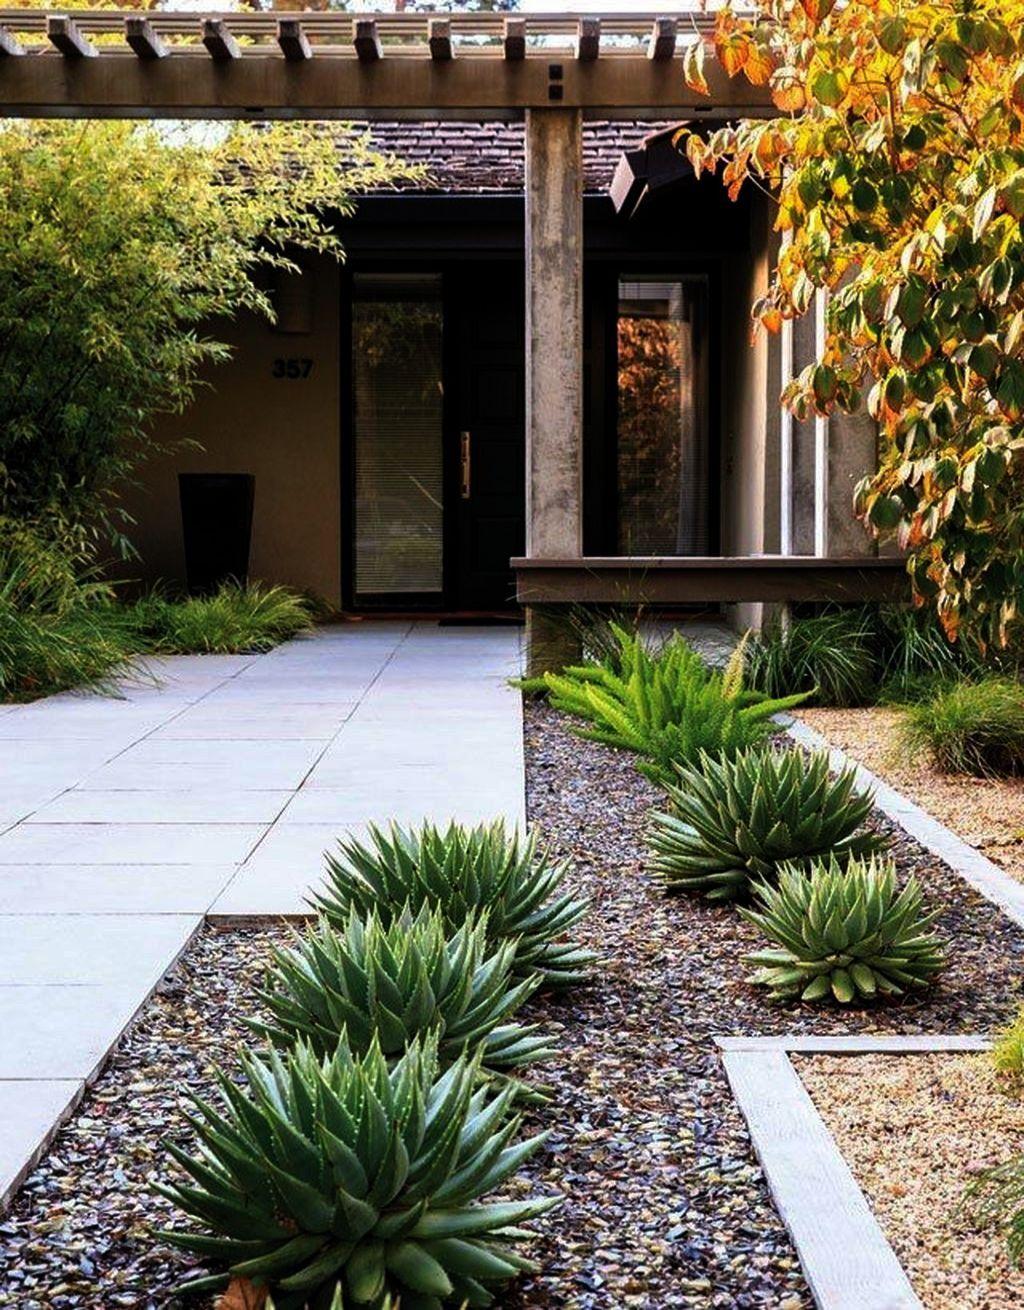 Landscape Gardening Insurance Neither Gardening And Landscape Design Business Diploma C Front Yard Landscaping Simple Yard Landscaping Simple Front Yard Design